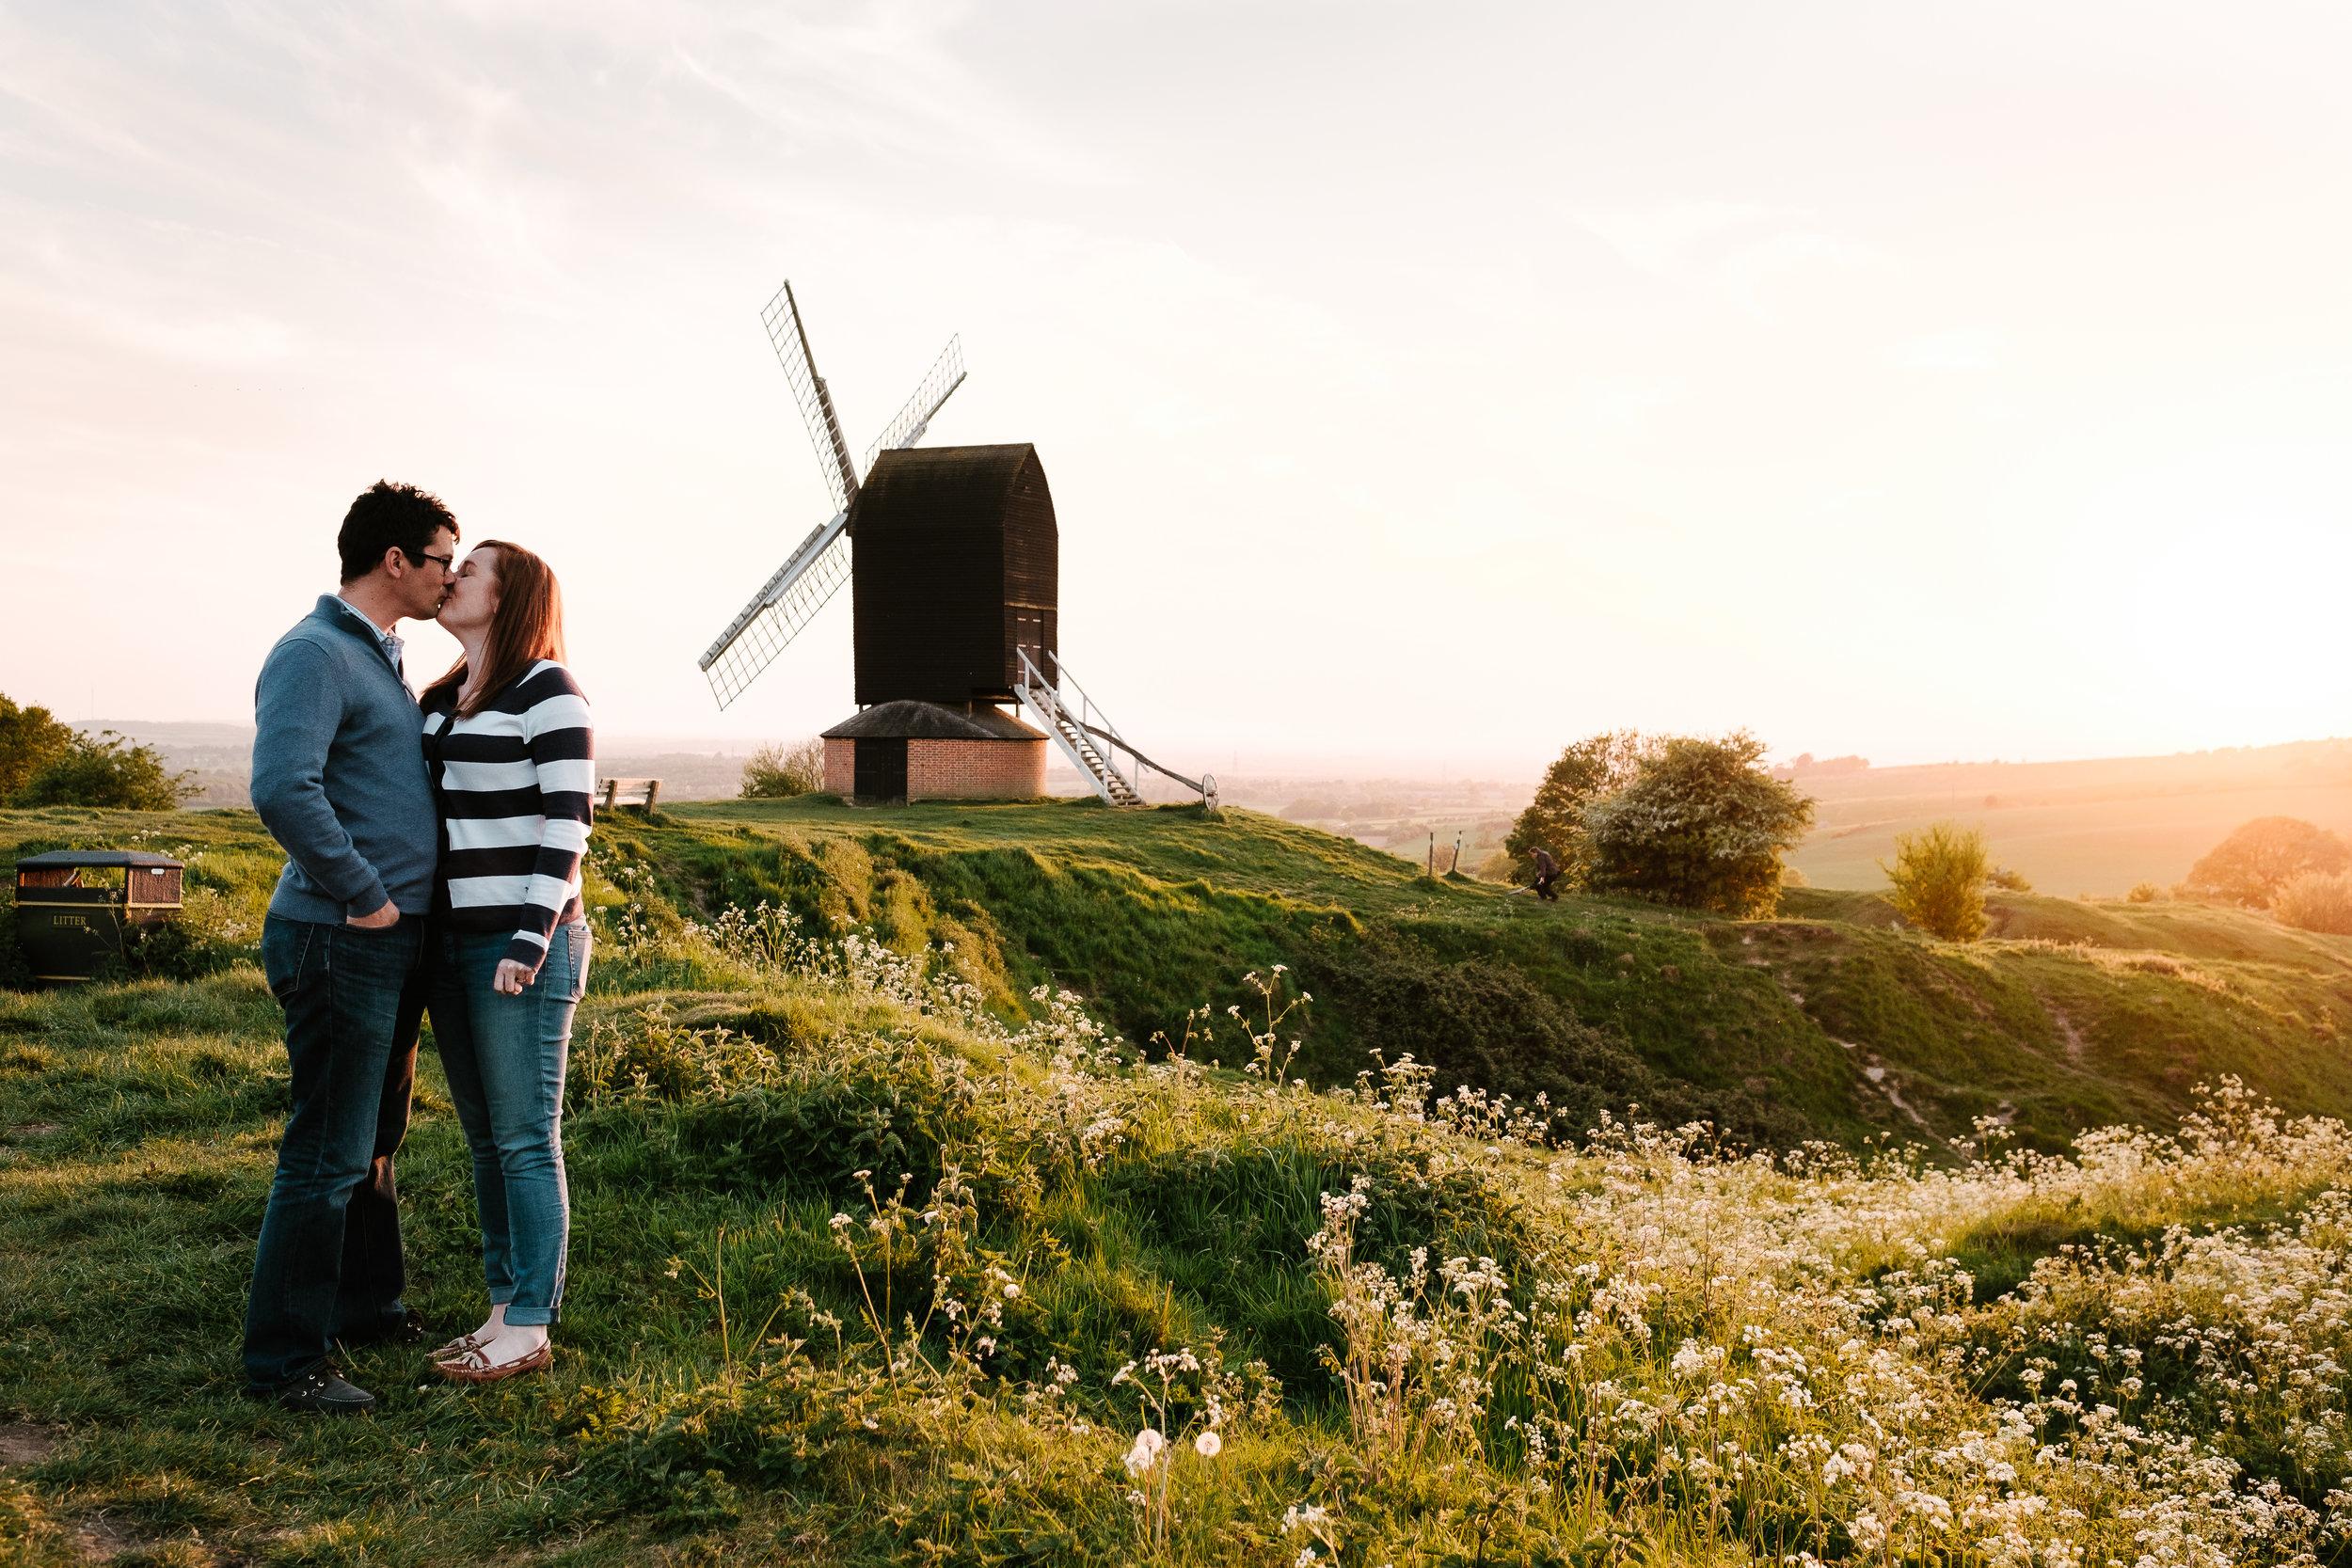 A Pre-wedding photoshoot of Jen and David at Brill Windmill, Buckinghamshire